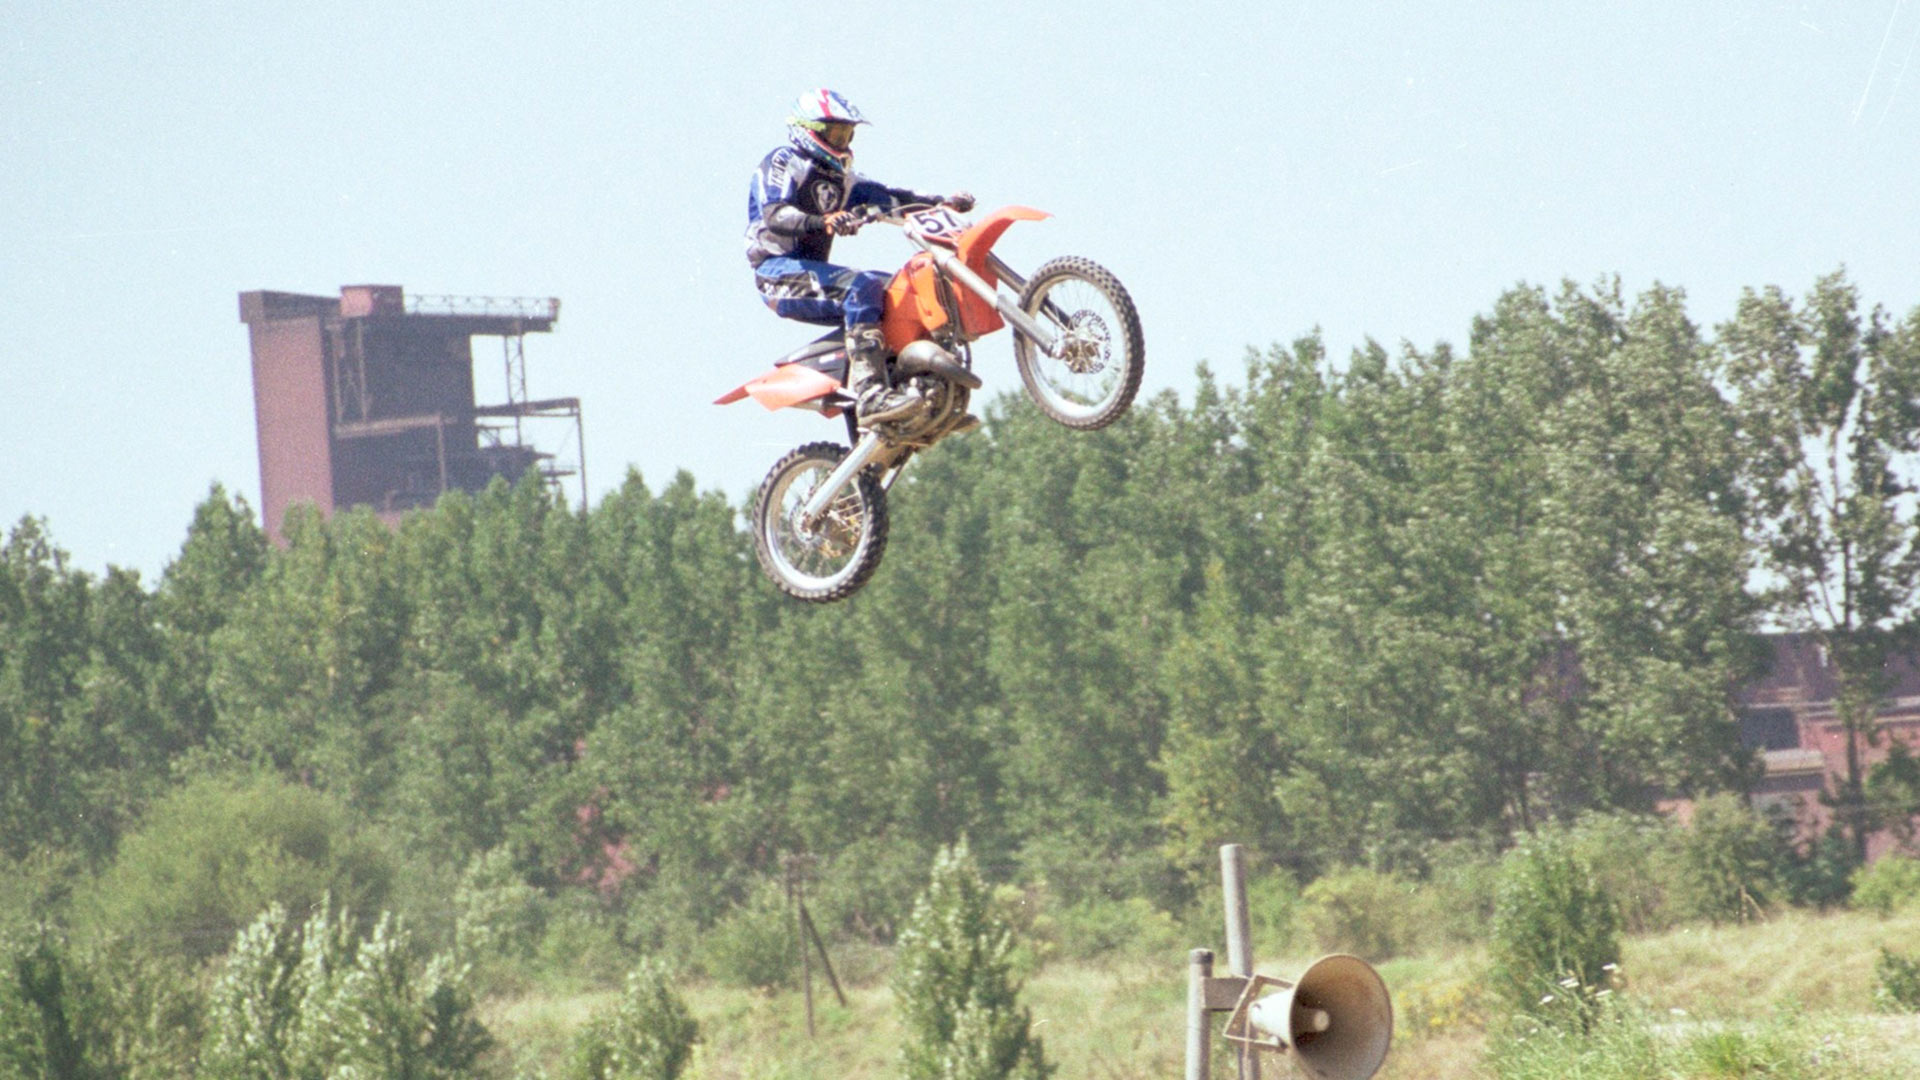 Motocross Stunt Sprung